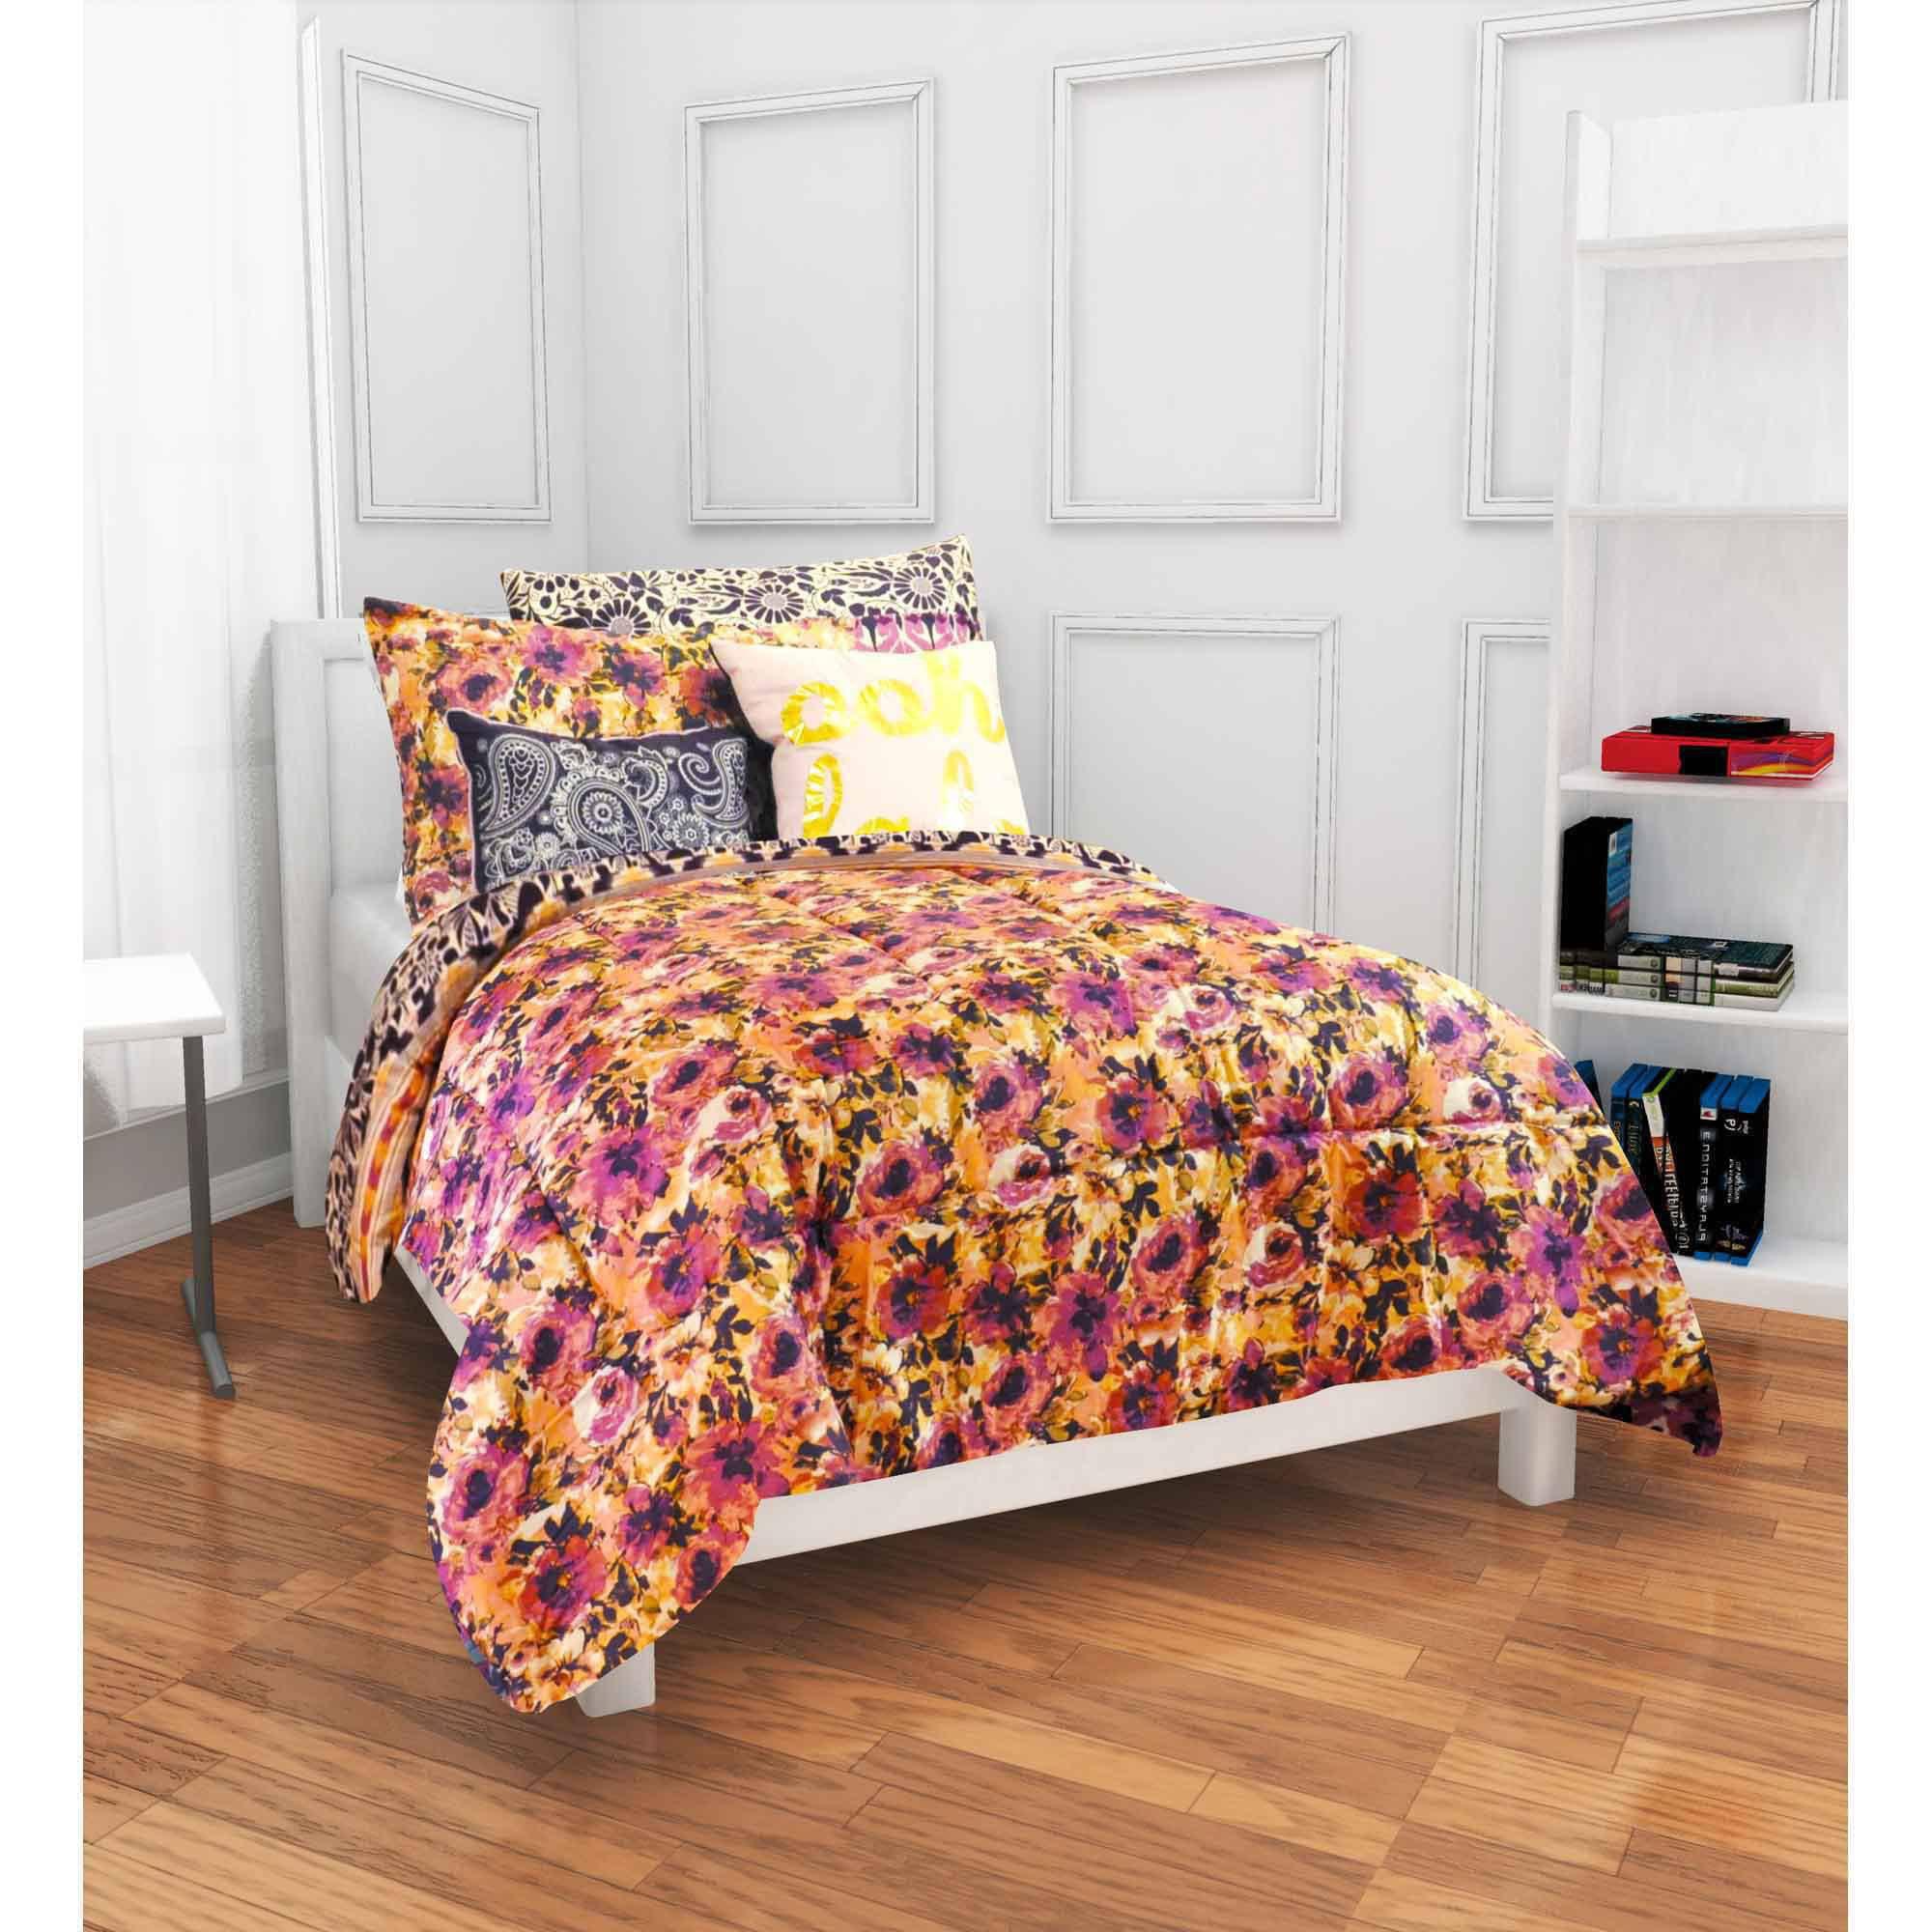 Anna Boho Bed in a Bag Comforter Set by Formula